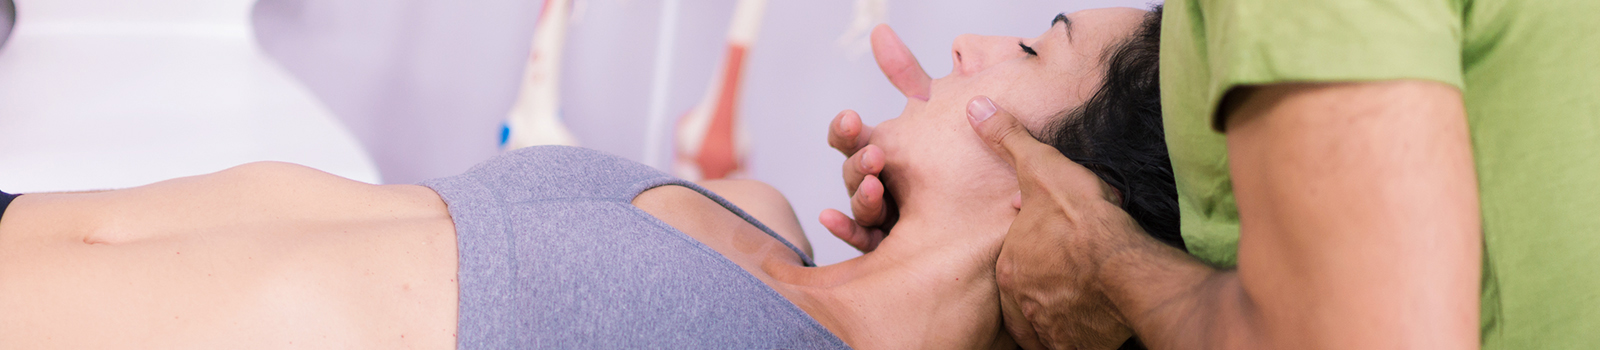 Técnicas Manipulativas Osteopáticas